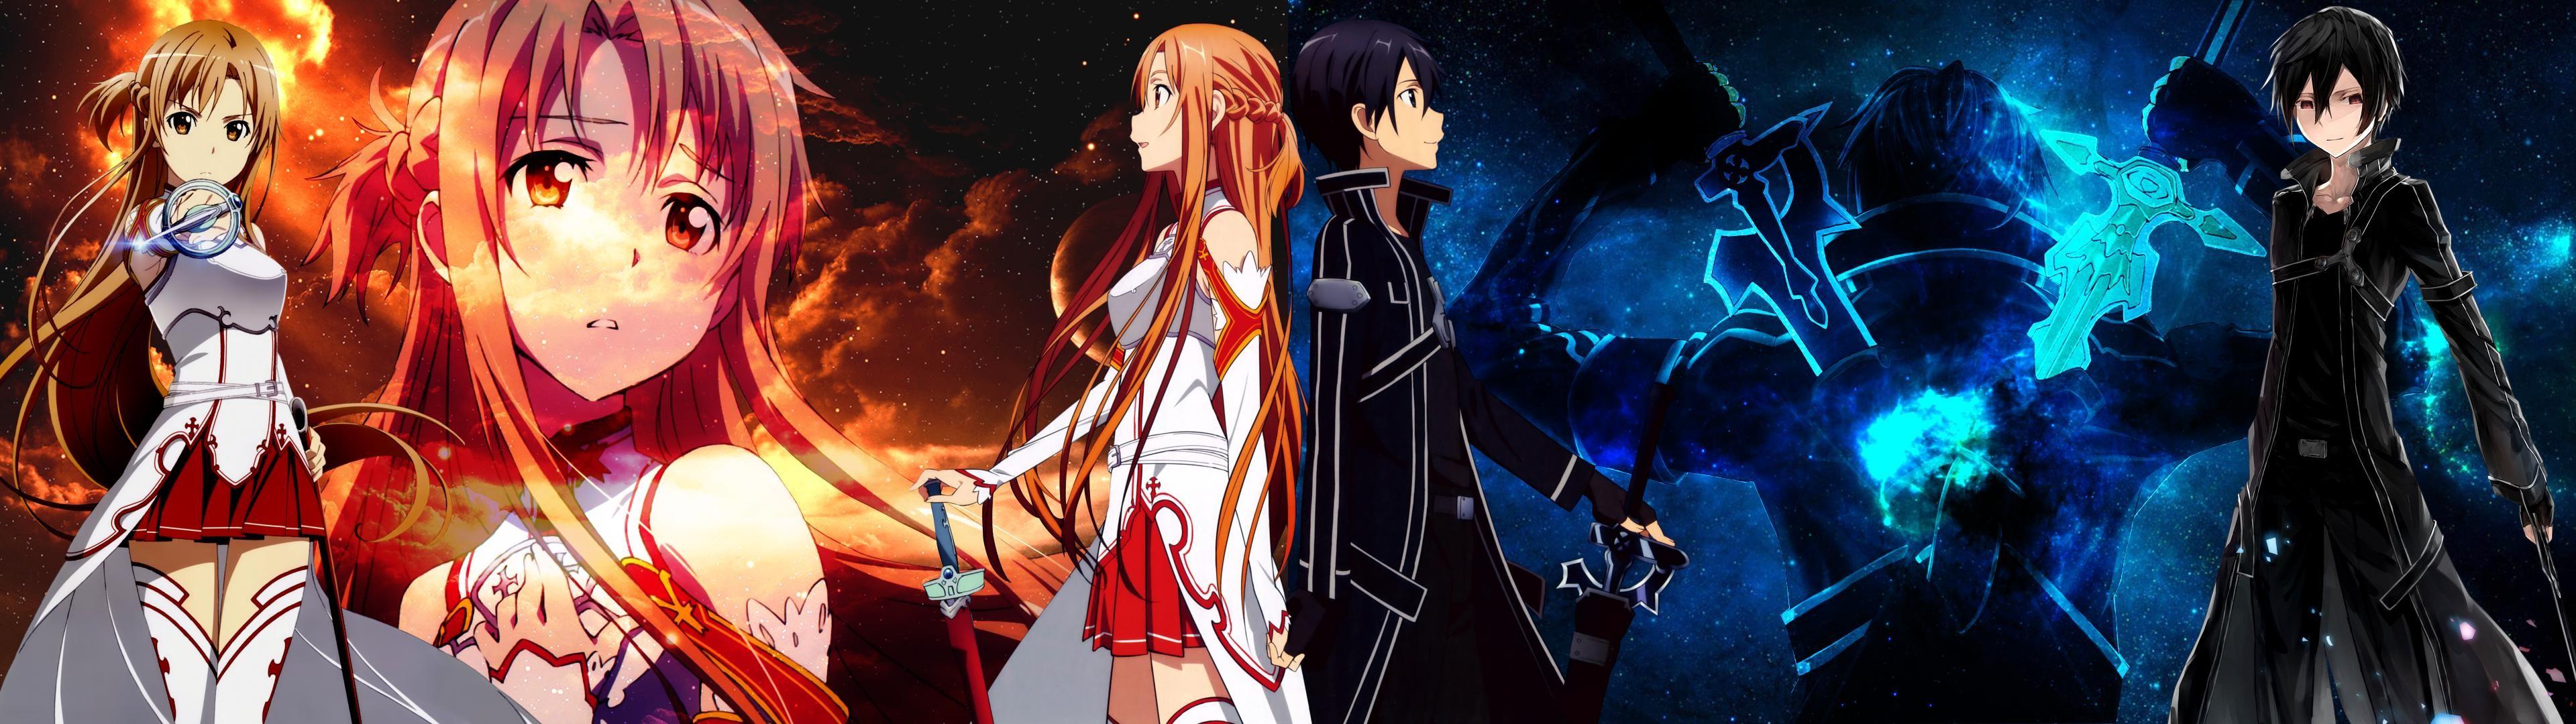 wallpaper : anime, sword art online, kirigaya kazuto, yuuki asuna